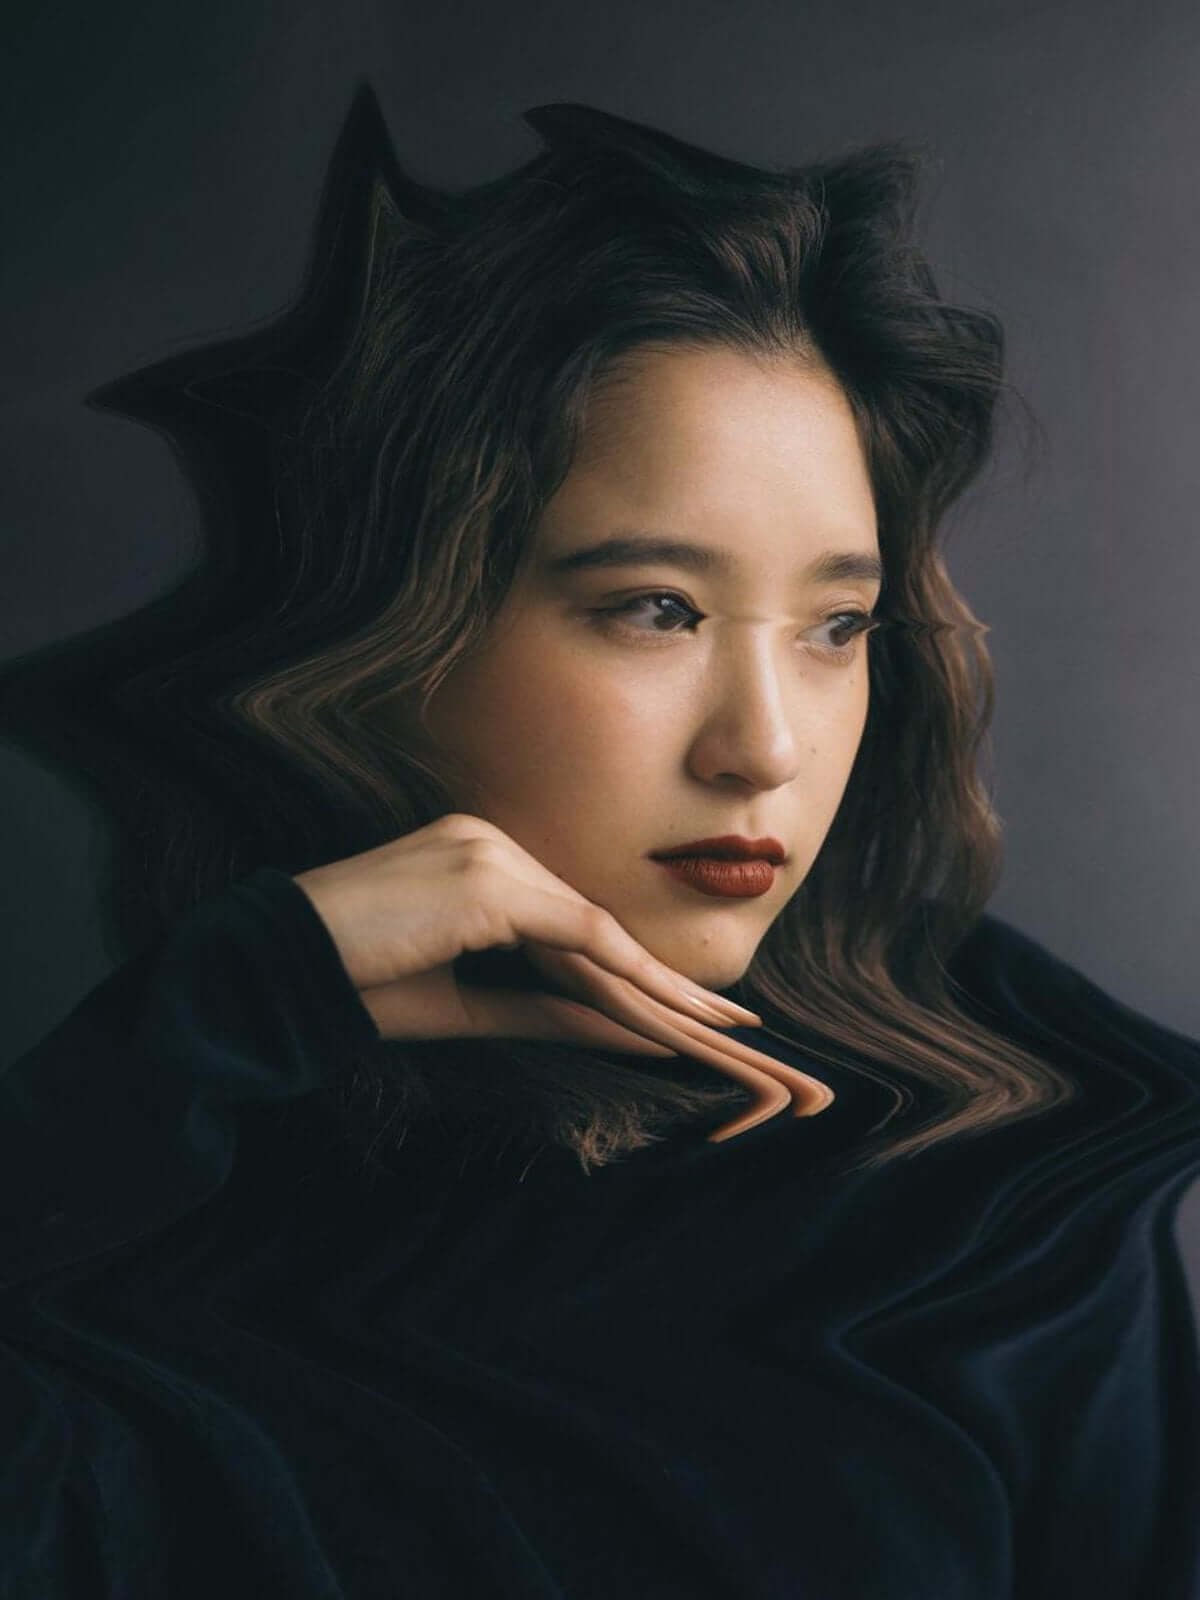 ZOMBIE-CHANGの新EP『されど幸せ』がリリース|山田智和が手掛ける表題曲のMVも公開 music190401-zombie-chang-1-1200x1600